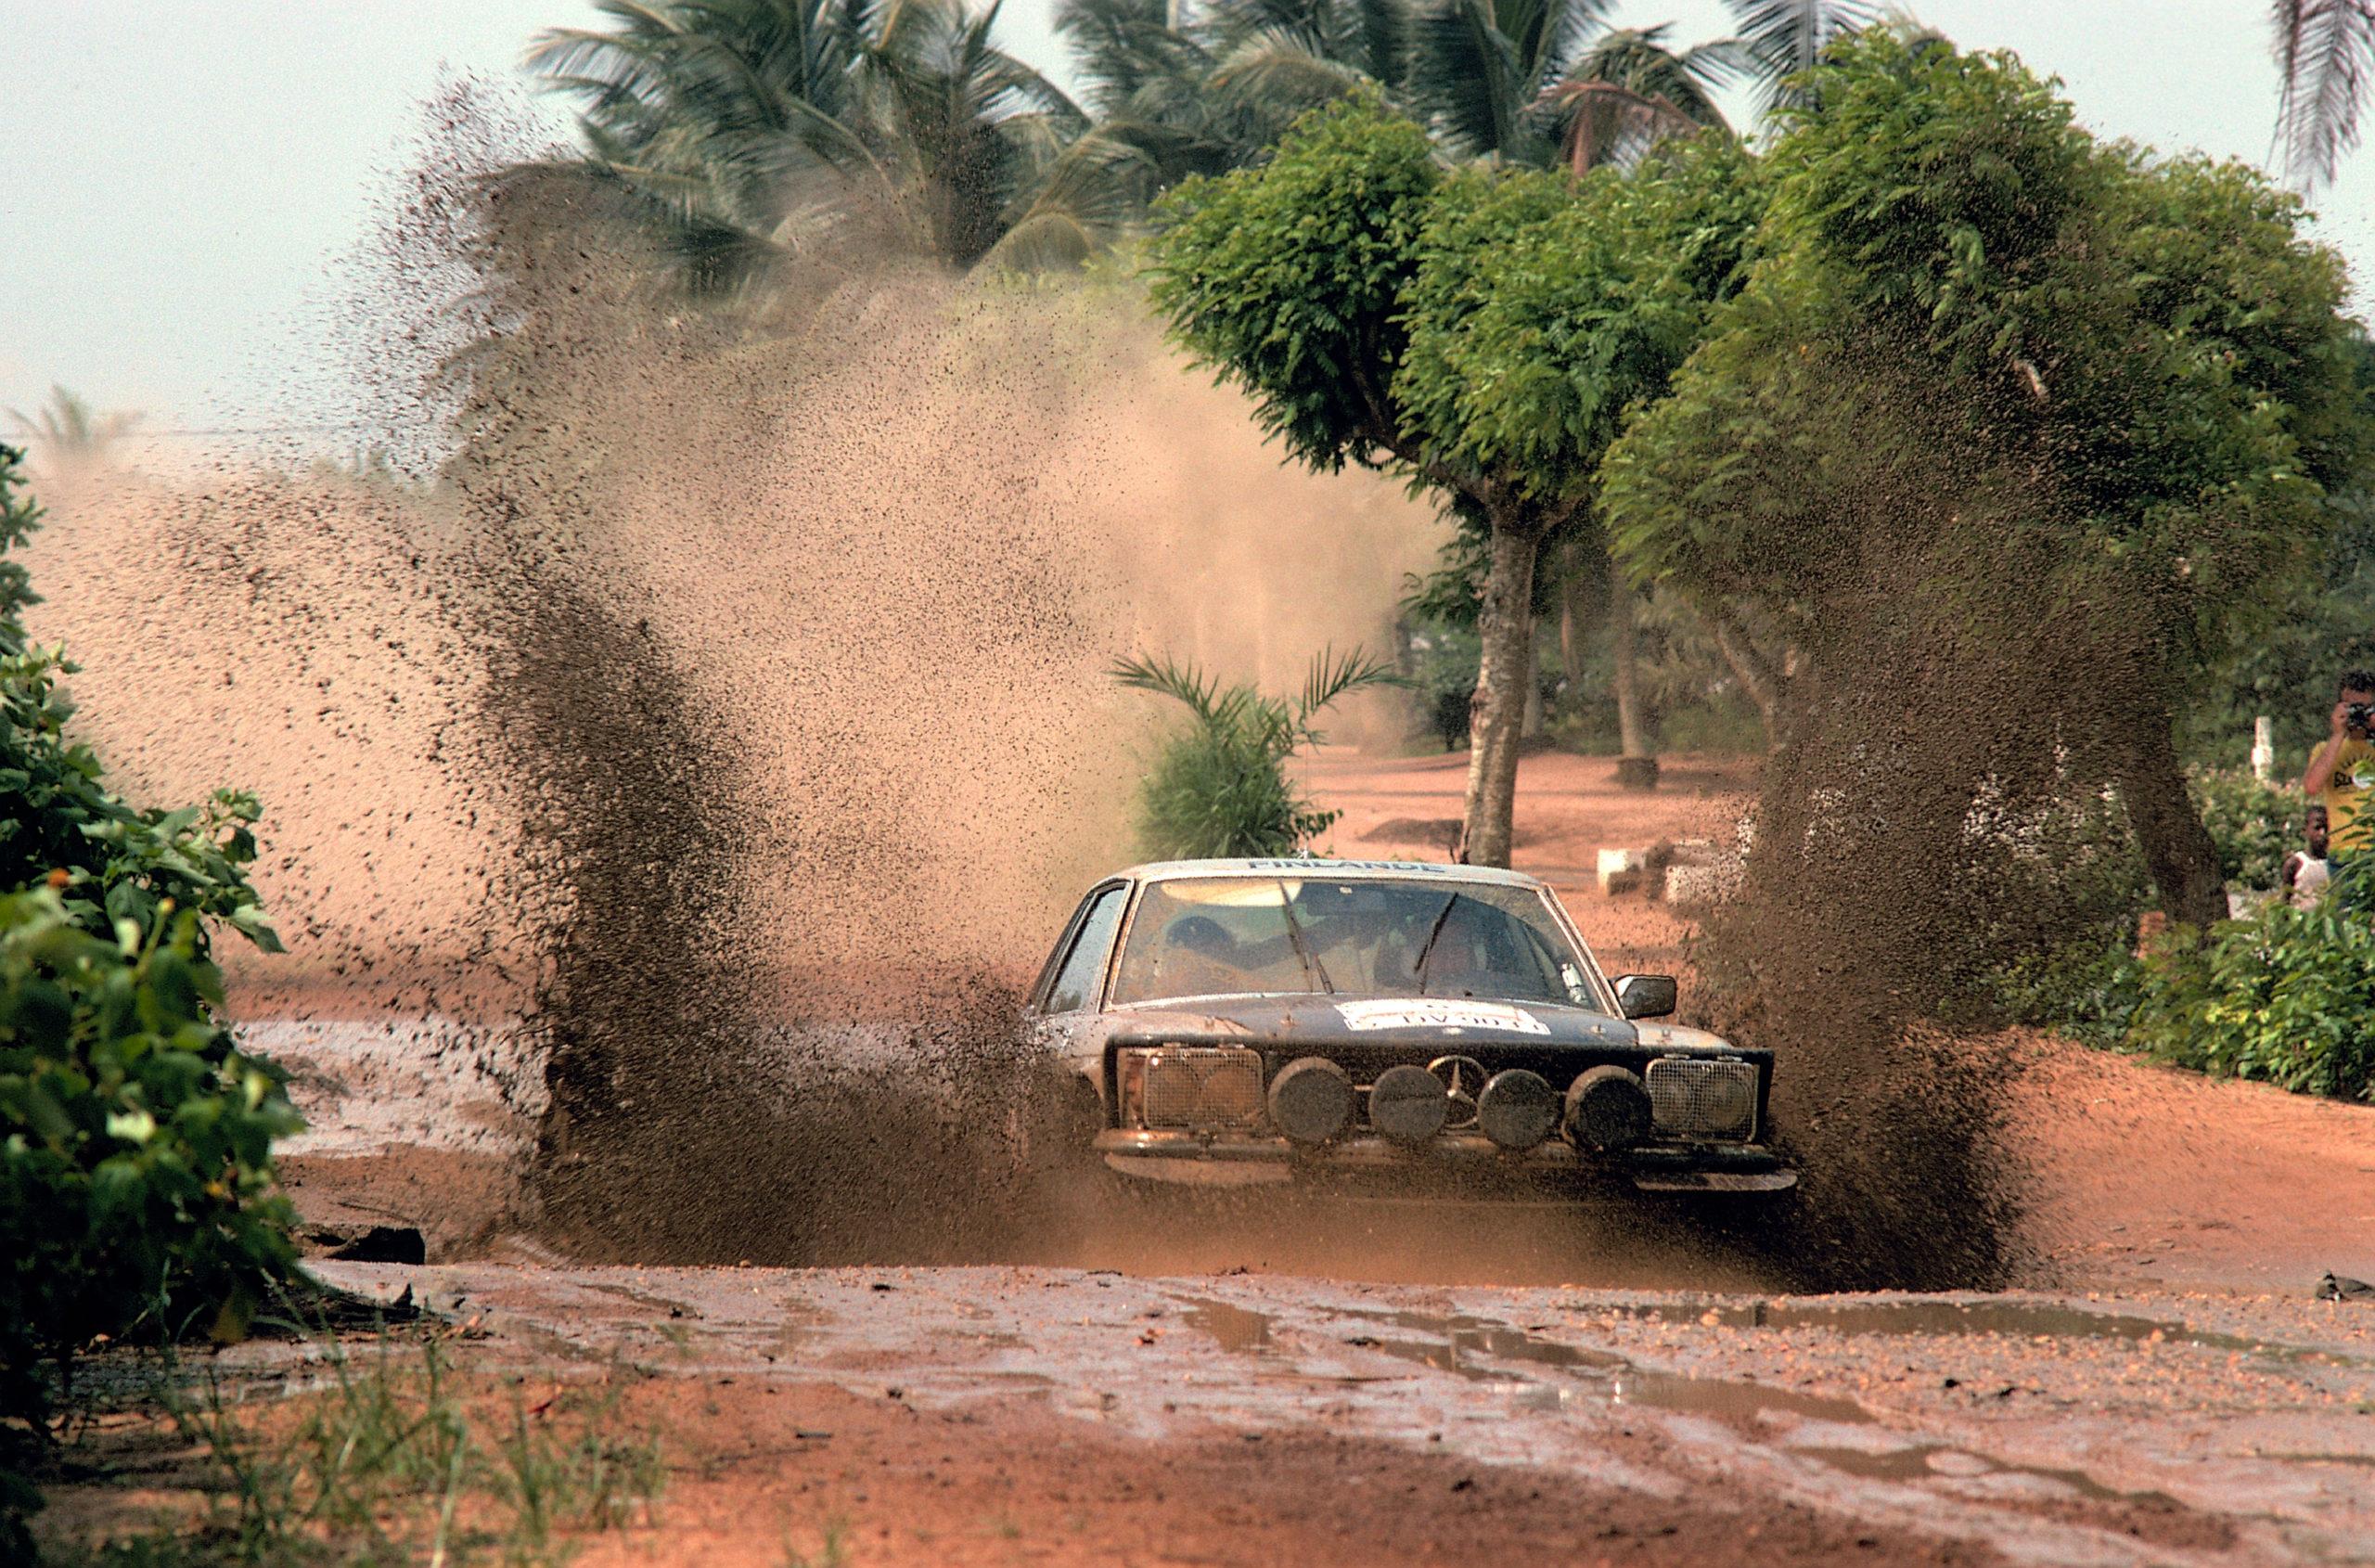 Hannu Mikkola's 450SLC ploughing through the Cote d'Ivoire